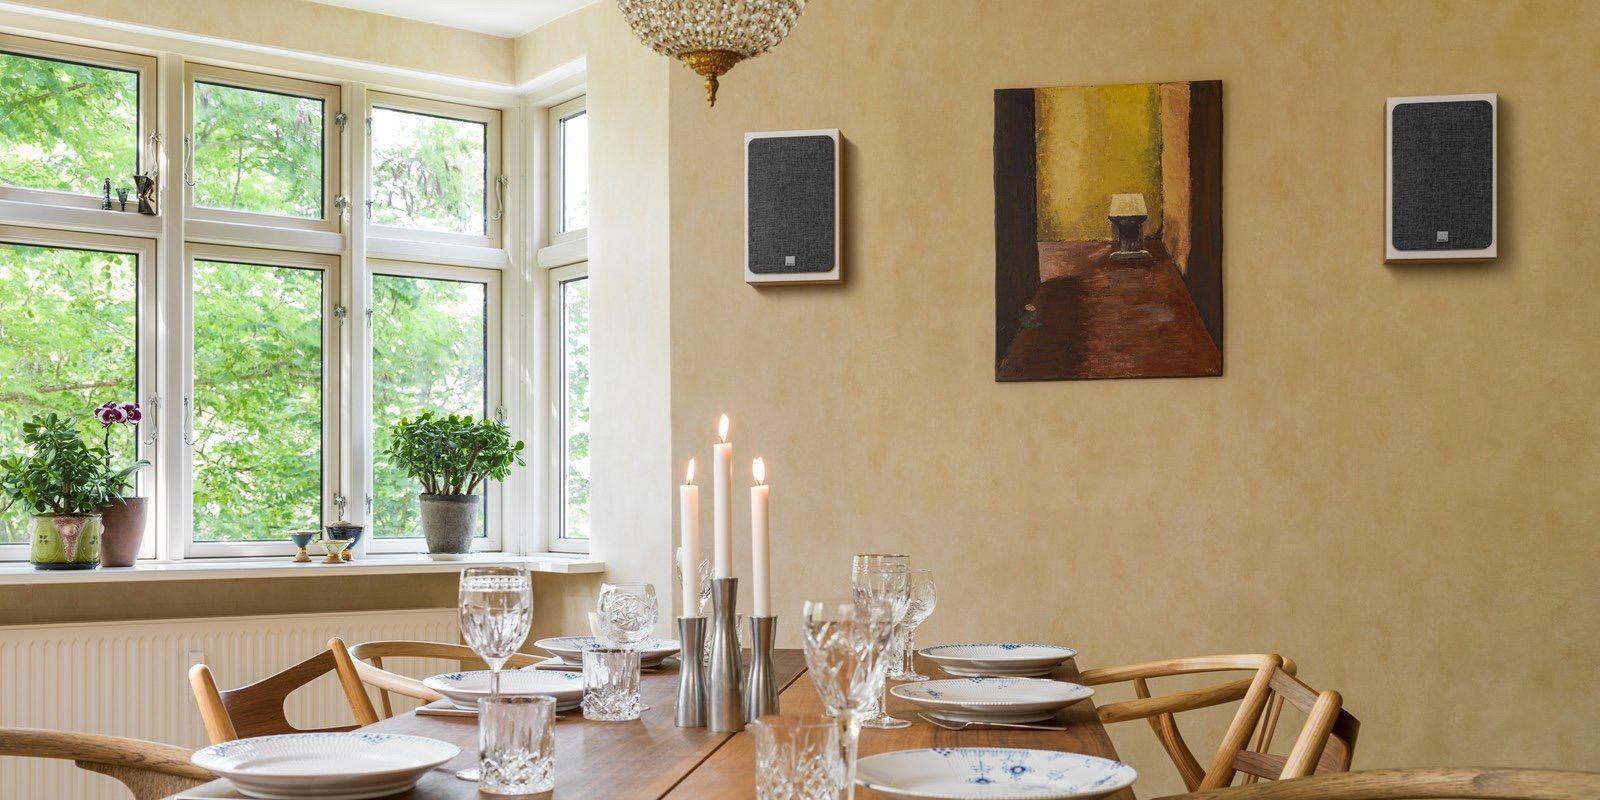 Dali Oberon On-Wall roble claro con rejilla en estereo